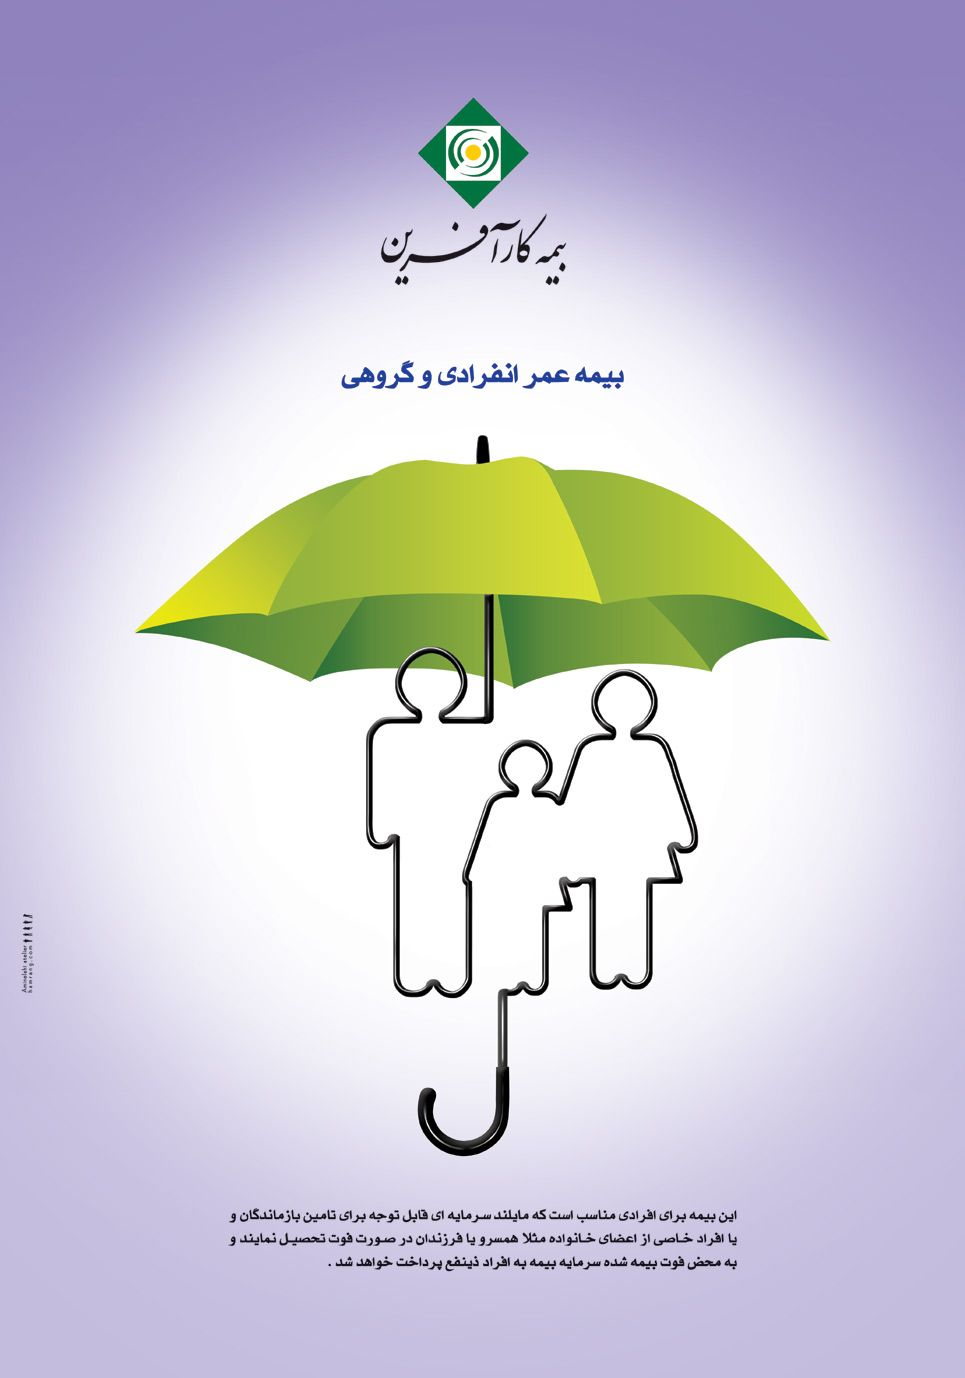 Kararfarin Insurance Advertising By Aminelahi Atelier 2009 Iranian Graphic Designer Onish Life Insurance Marketing Low Car Insurance Life Insurance Sales